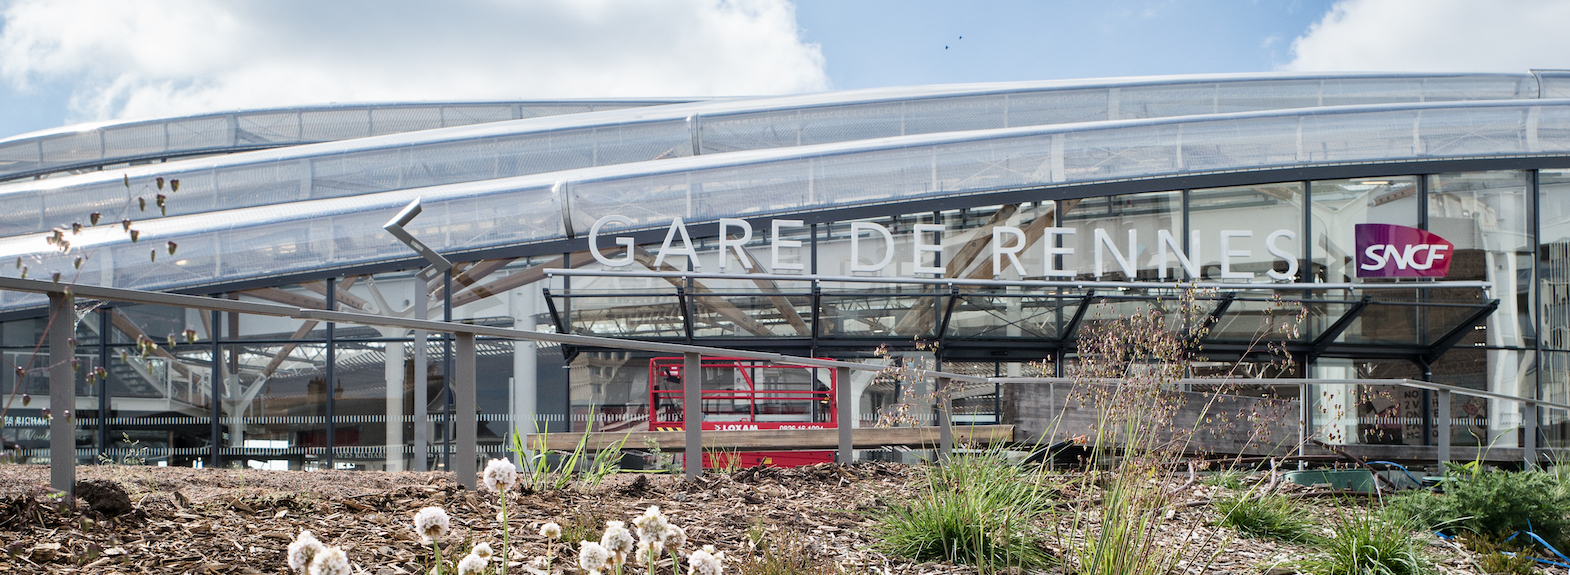 1-Gare_Nord-Eurorennes_mai_2019-HD.jpg